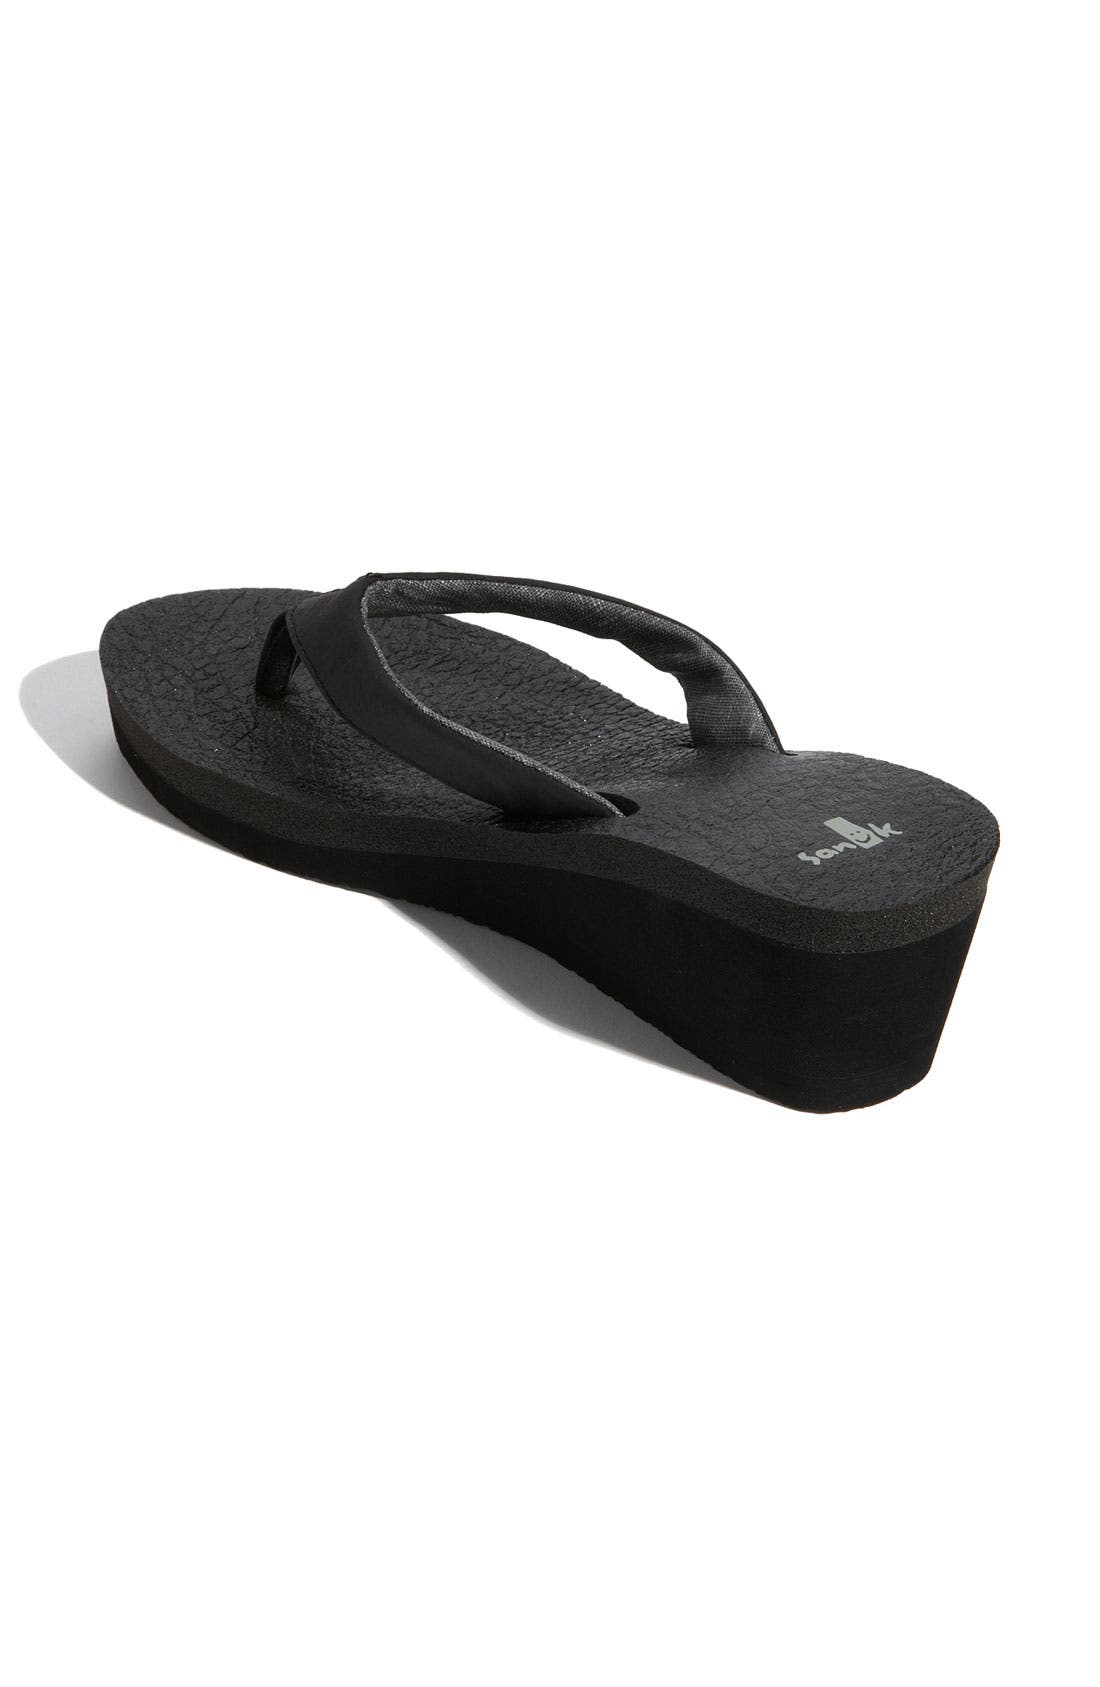 Alternate Image 2  - Sanuk 'Yoga Mat' Wedge Flip Flop (Women)